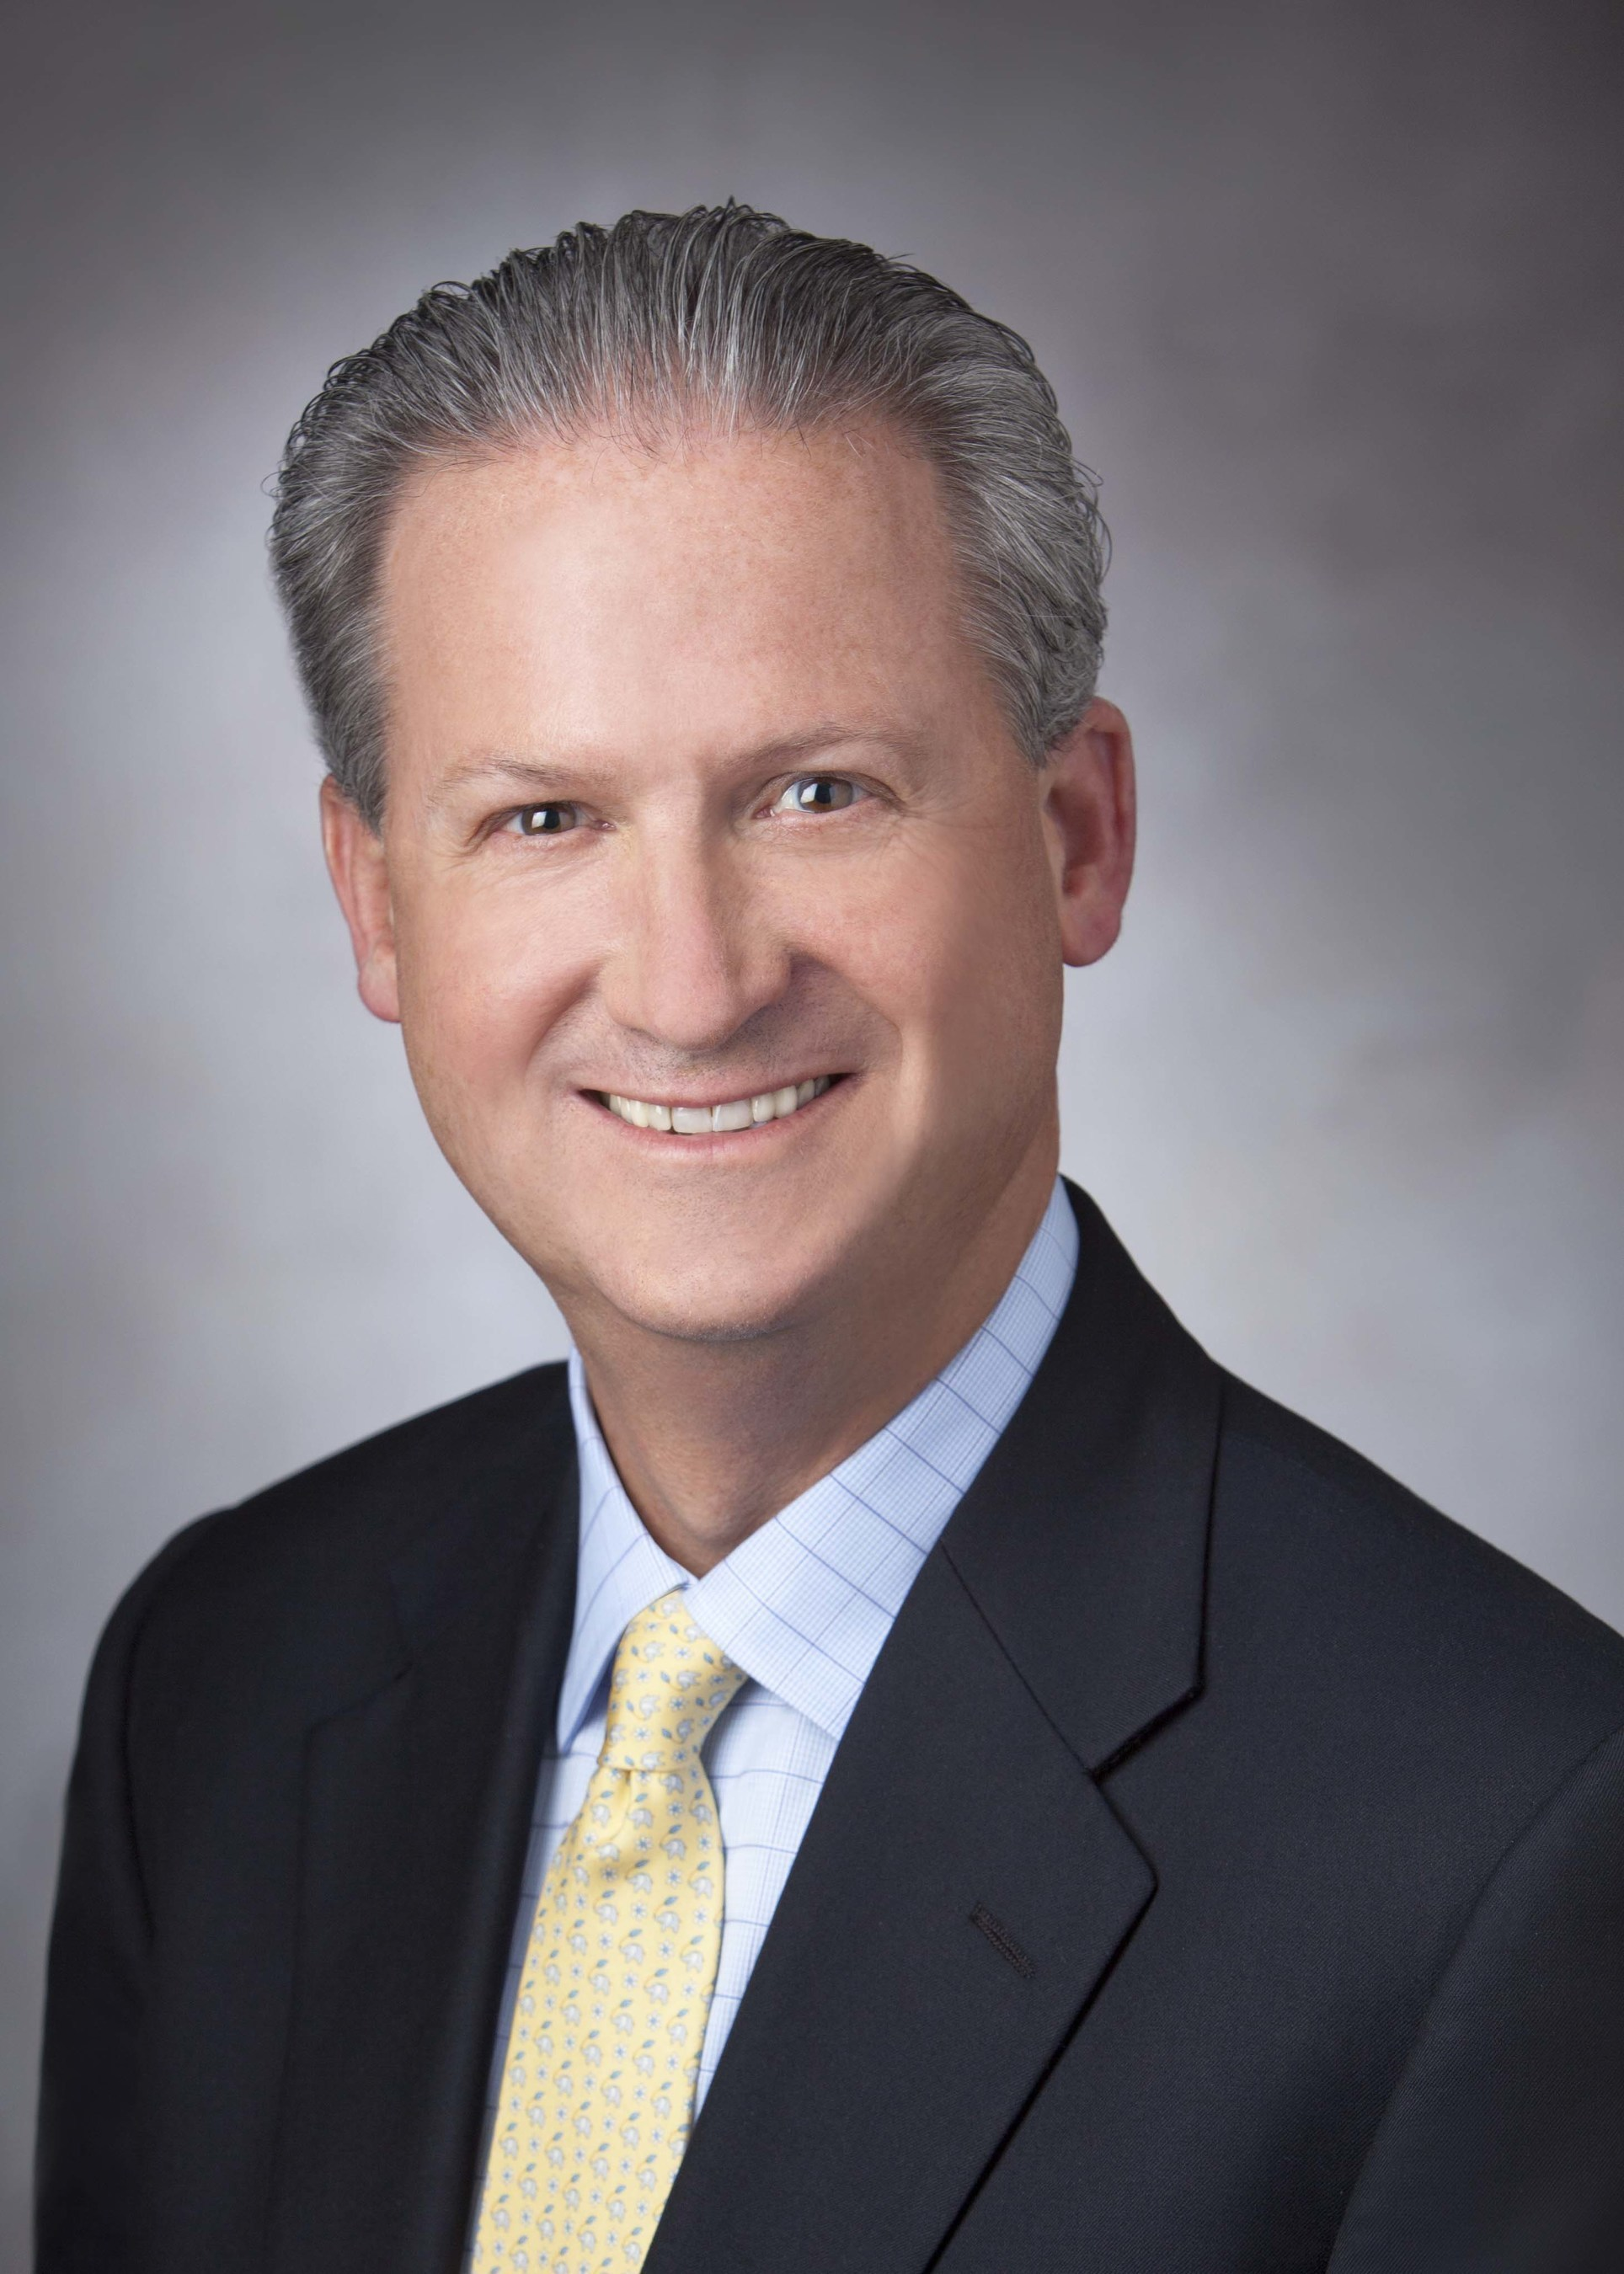 KPMG U.S. Deputy Chairman and COO P. Scott Ozanus